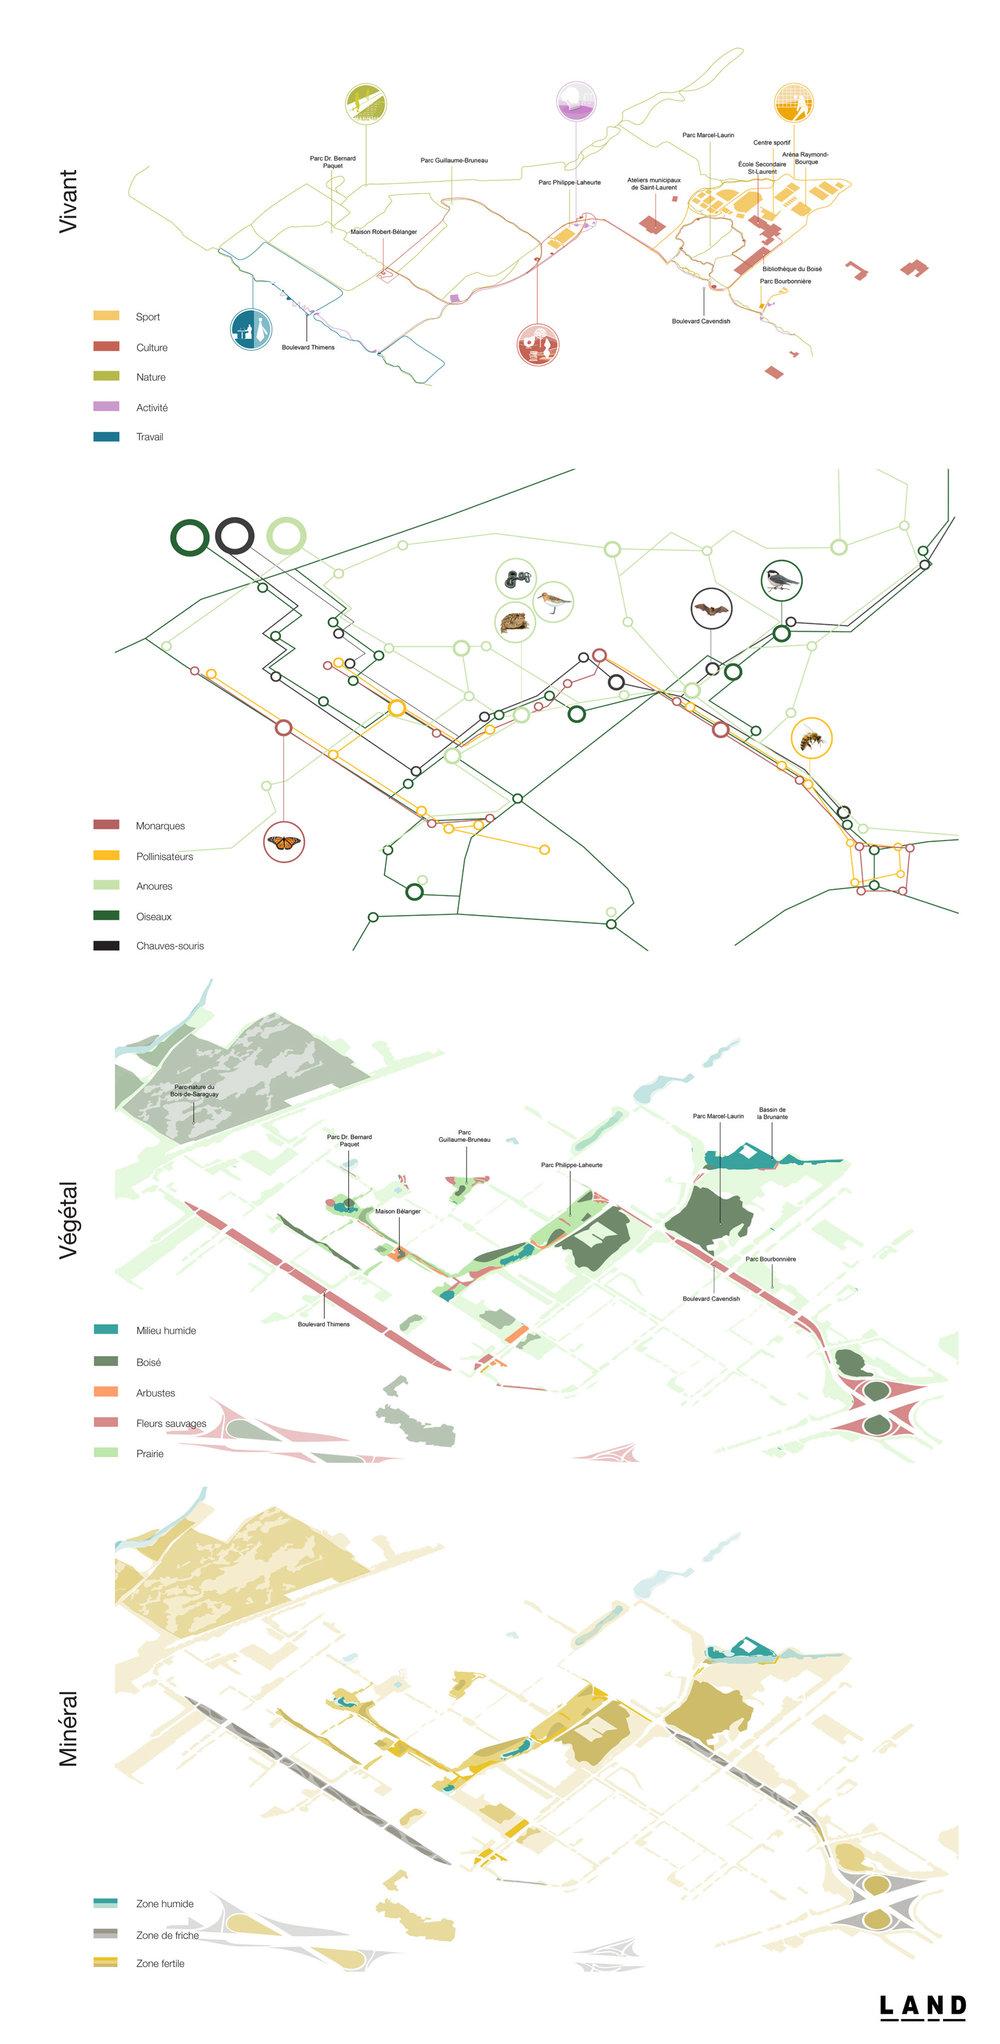 LAND_Corridor Biodiversité_Layers.jpg